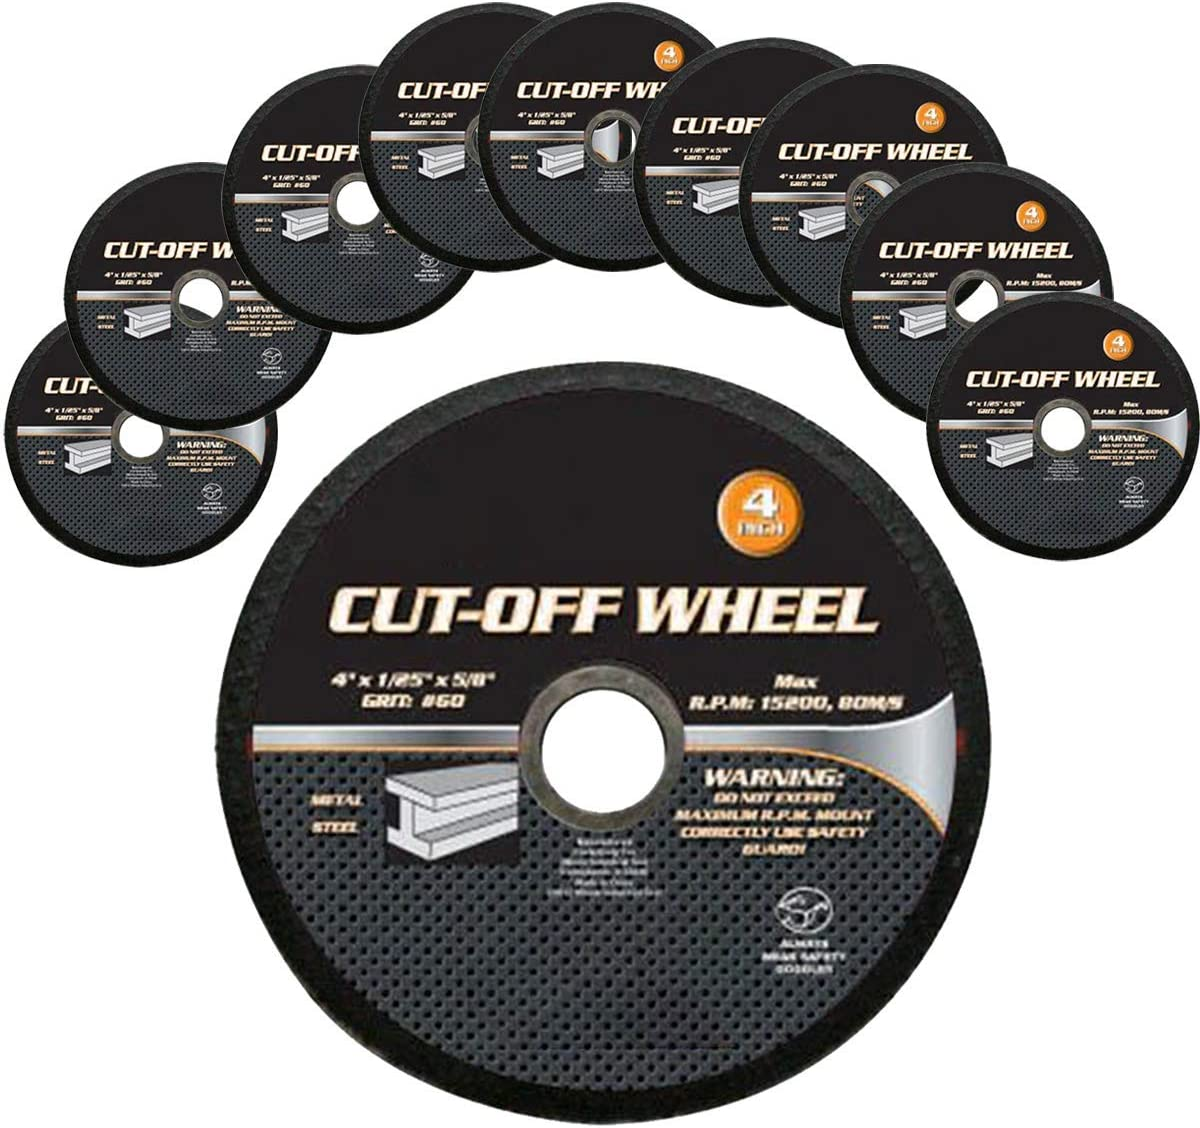 4 Inch Cutting Wheels Grinding Discs Cut-Off Wheel for Metal 20 Pcs